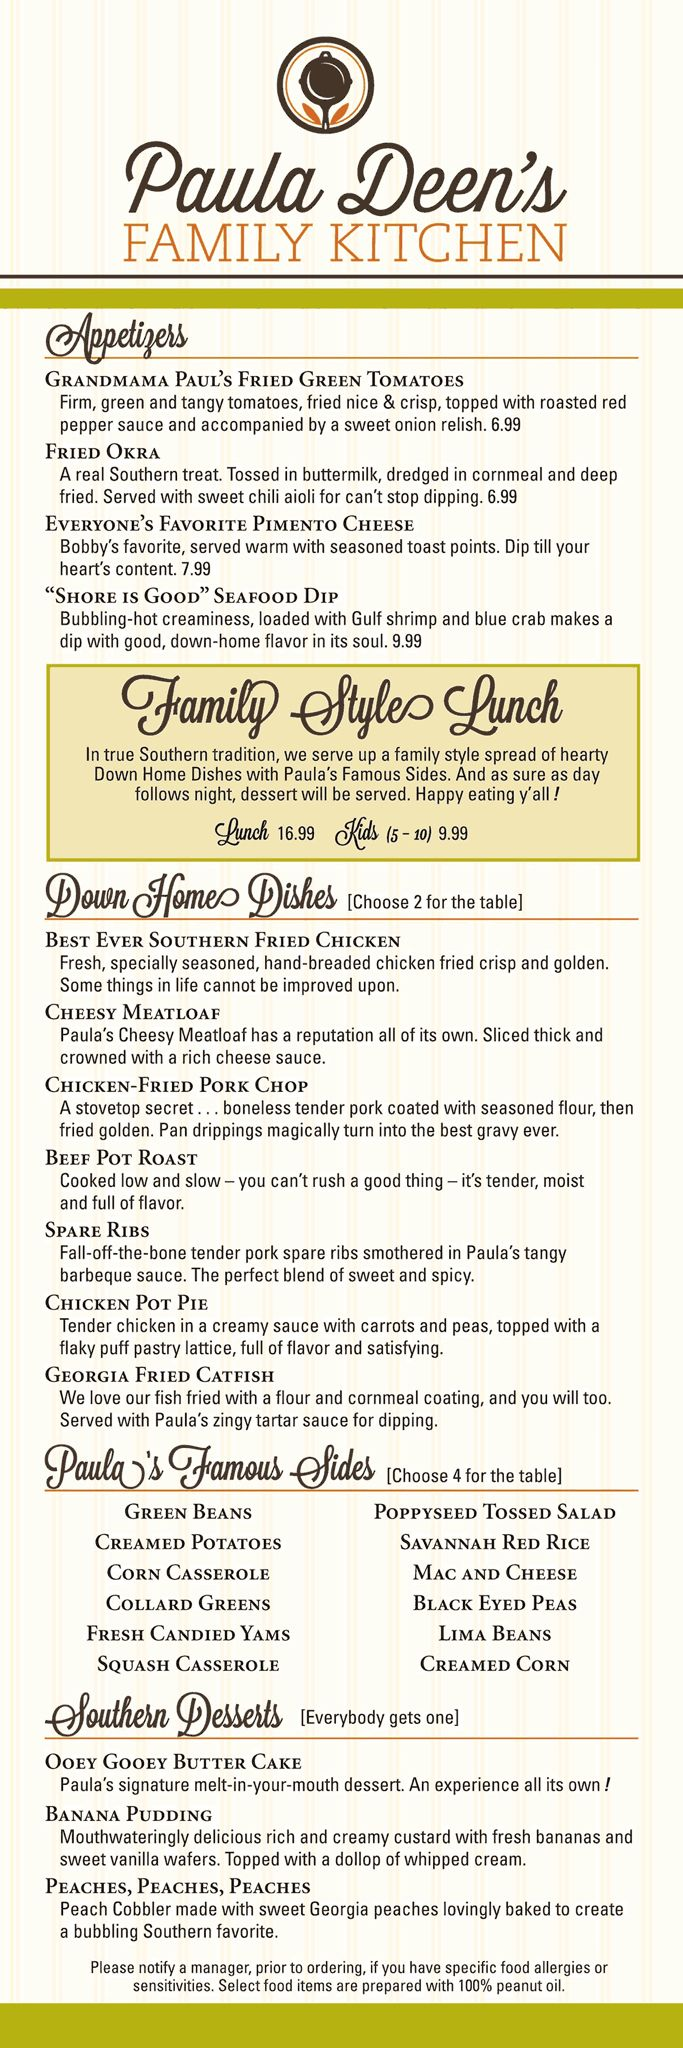 Paula Deen\'s Pigeon Forge Restaurant | Lunch menu, Family kitchen ...